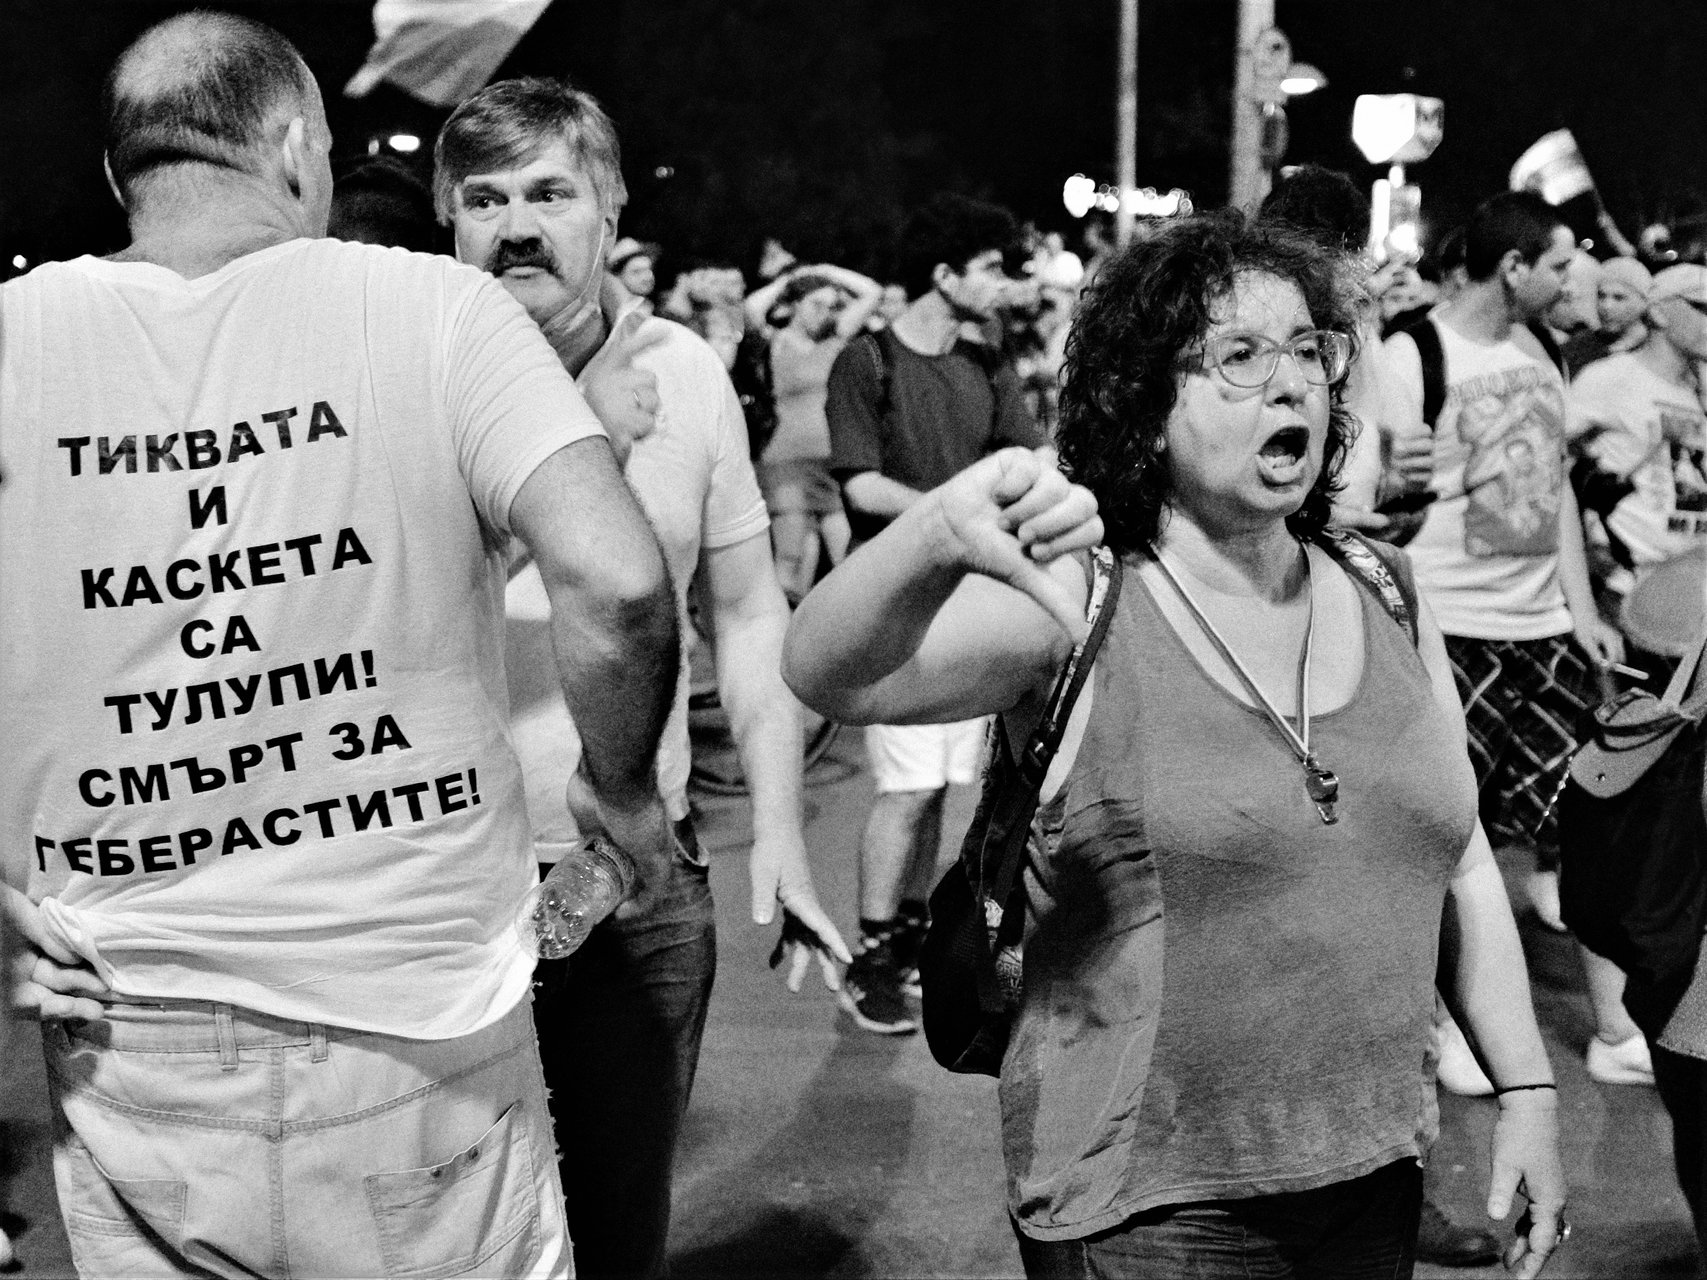 Photo in Reportage | Author Николай Павлов - ntpavlov | PHOTO FORUM